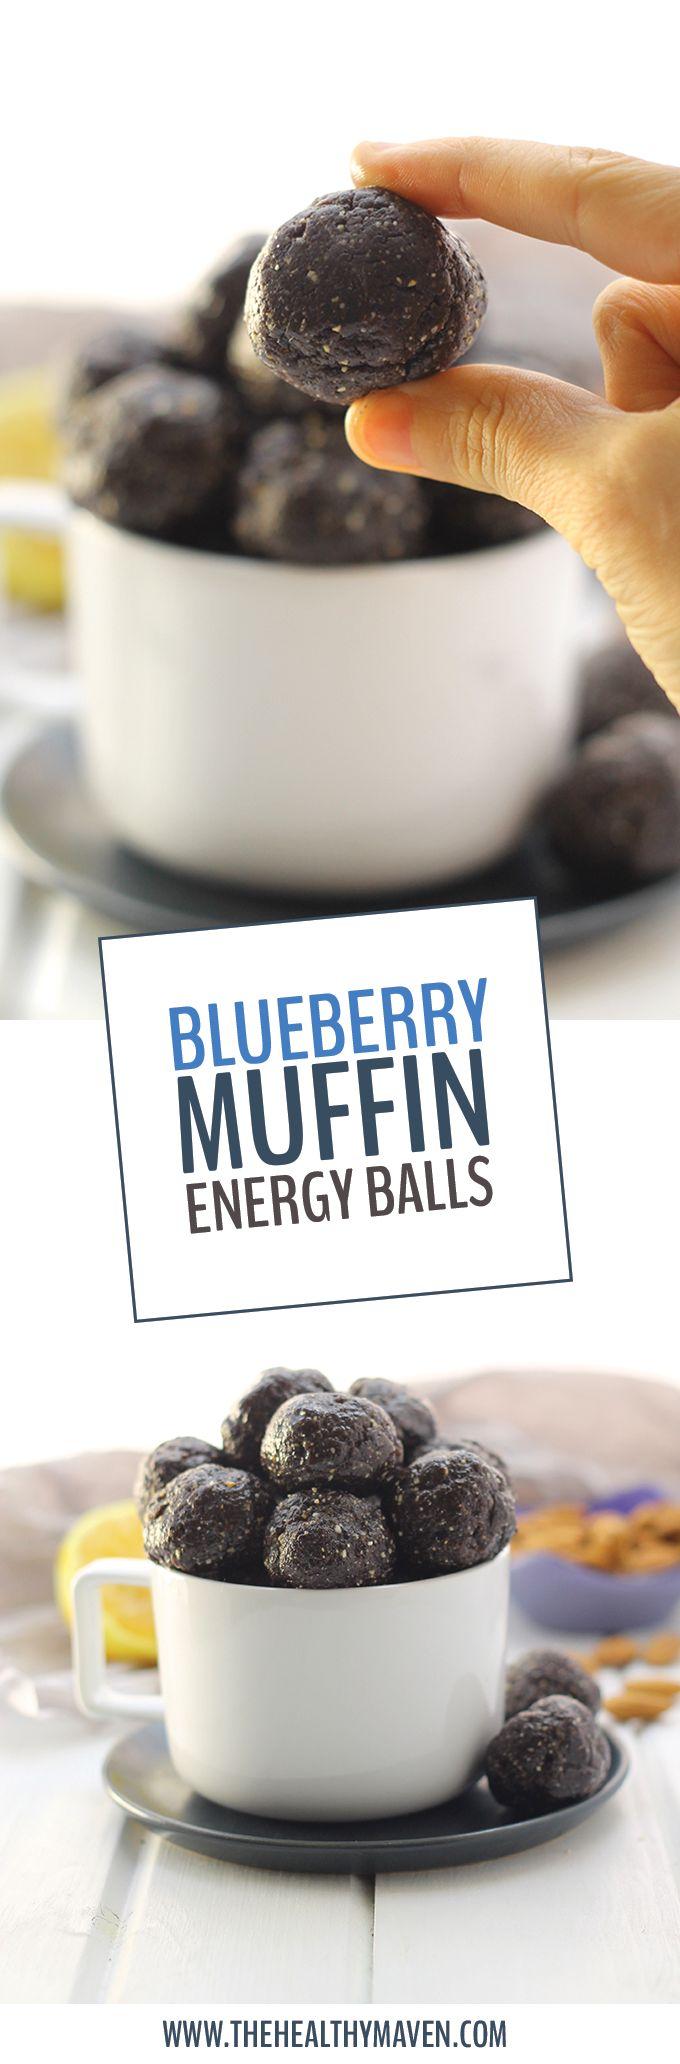 blueberrymuffinpin